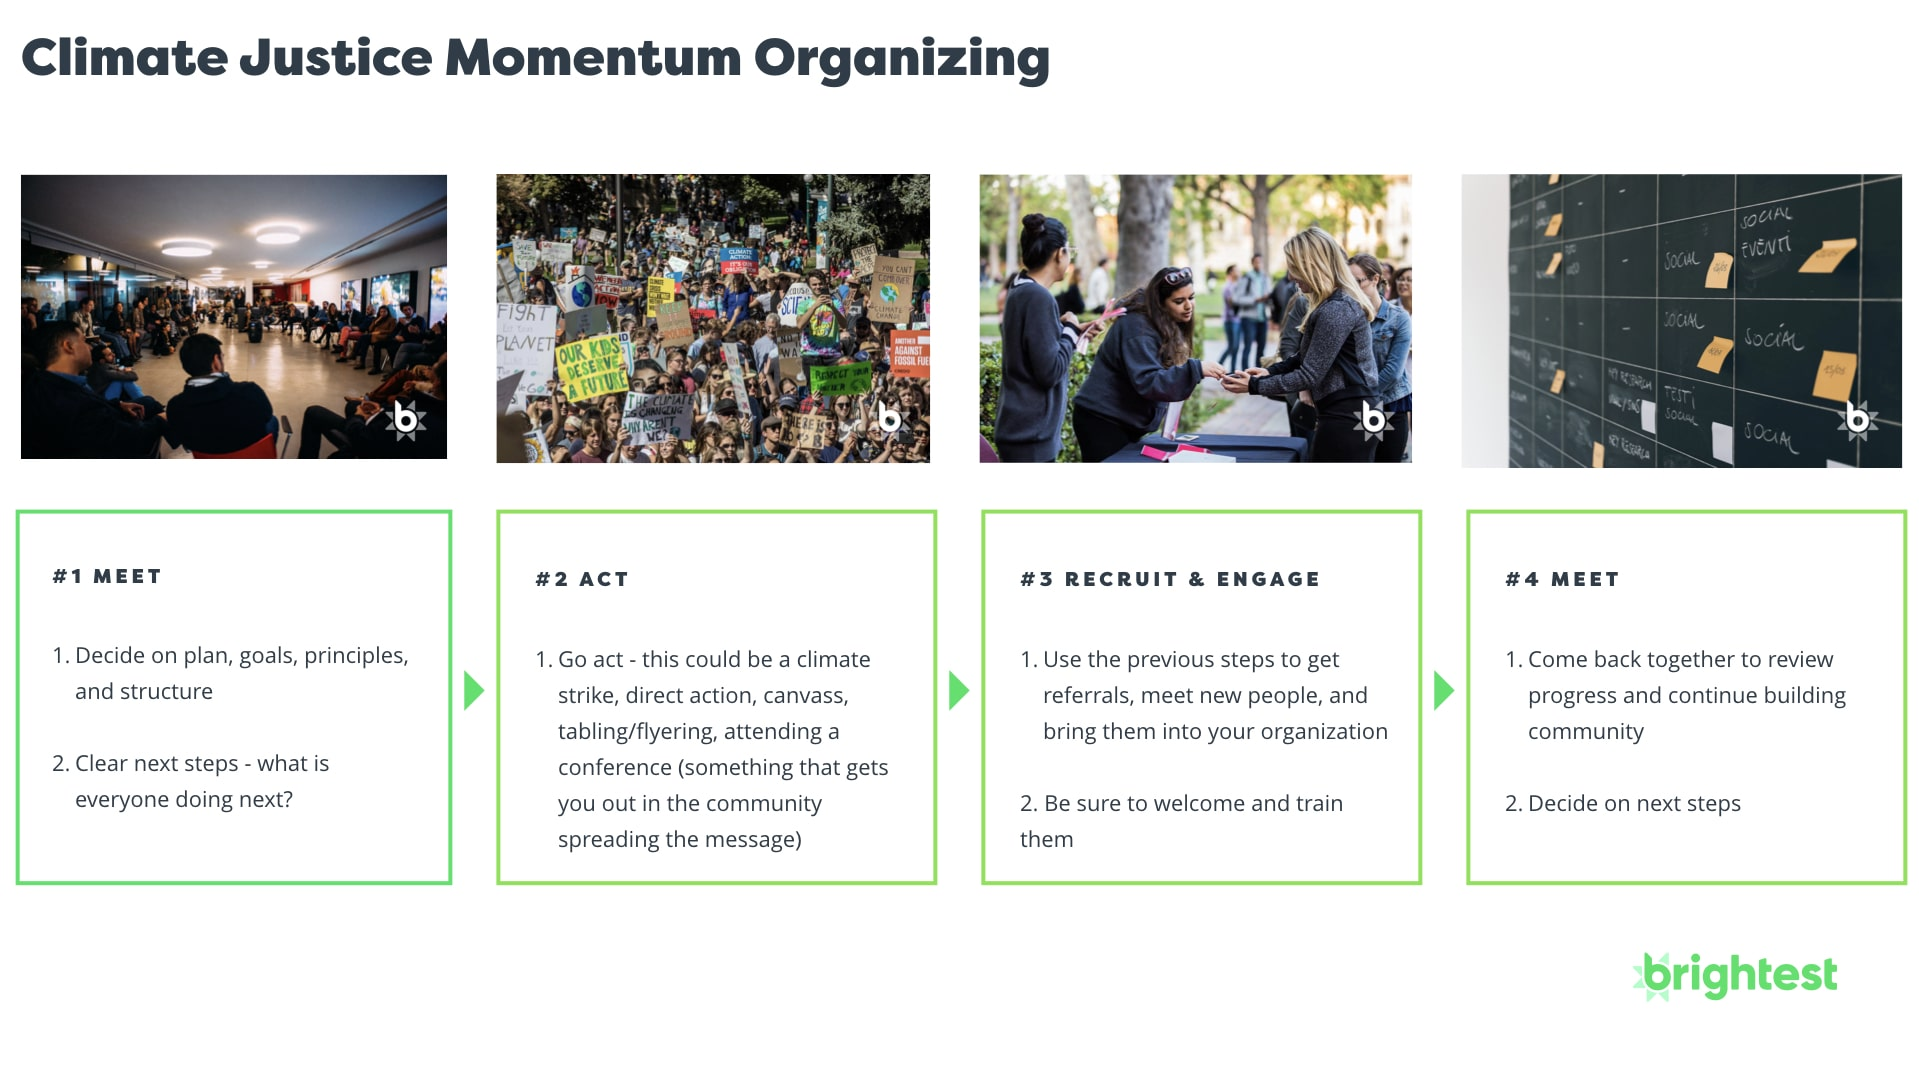 Climate Changing Momentum Organizing